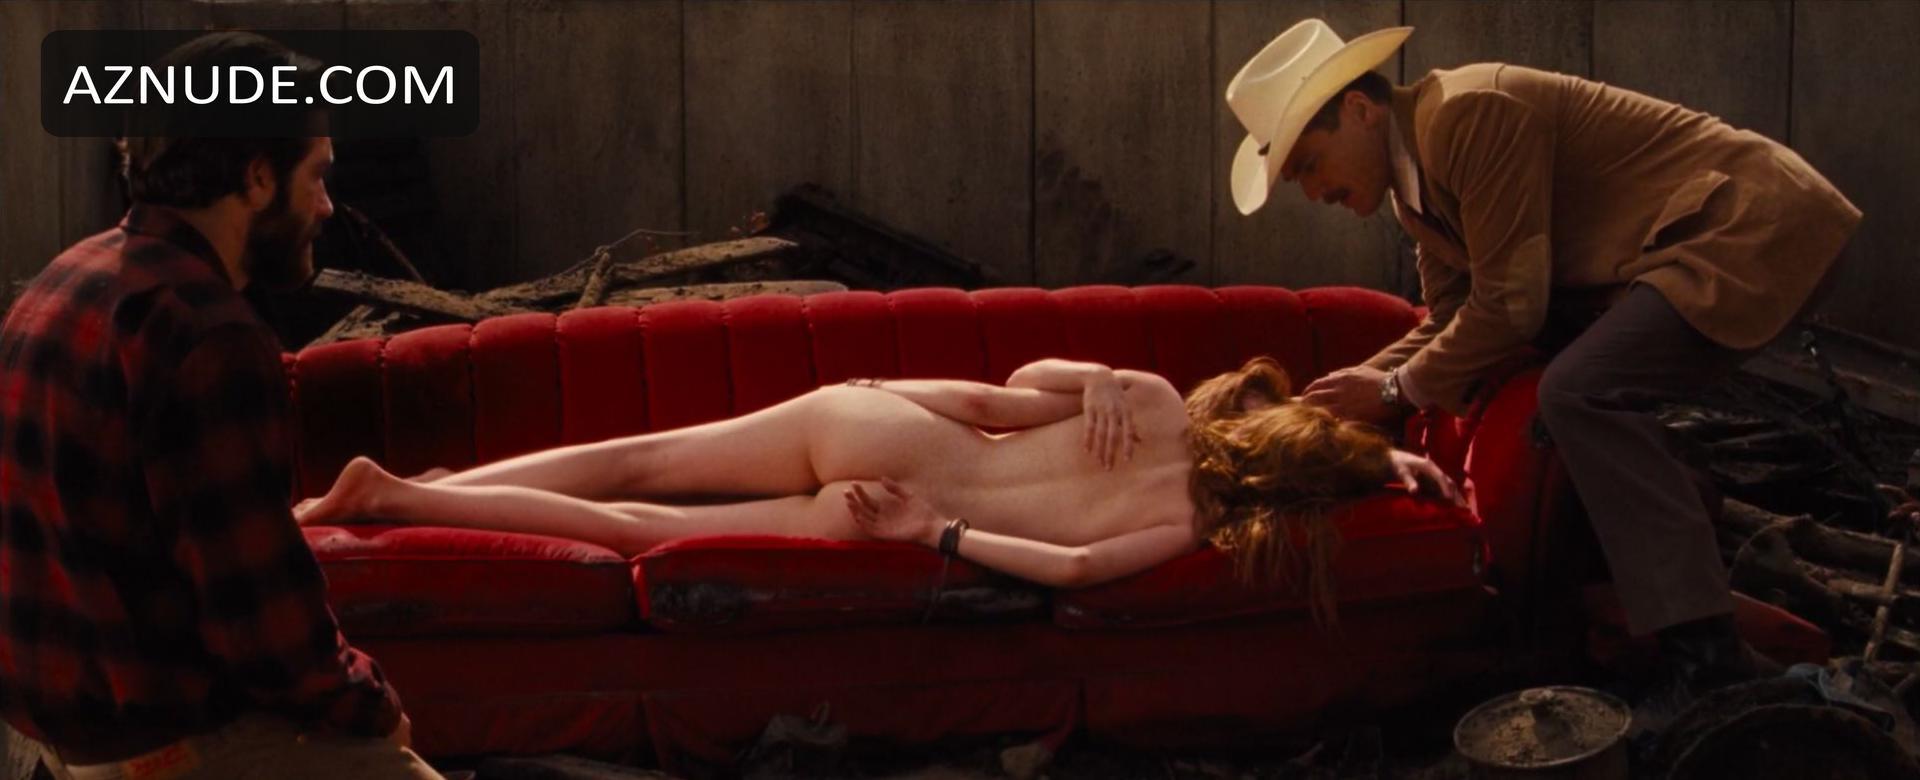 Ellie bamber nude